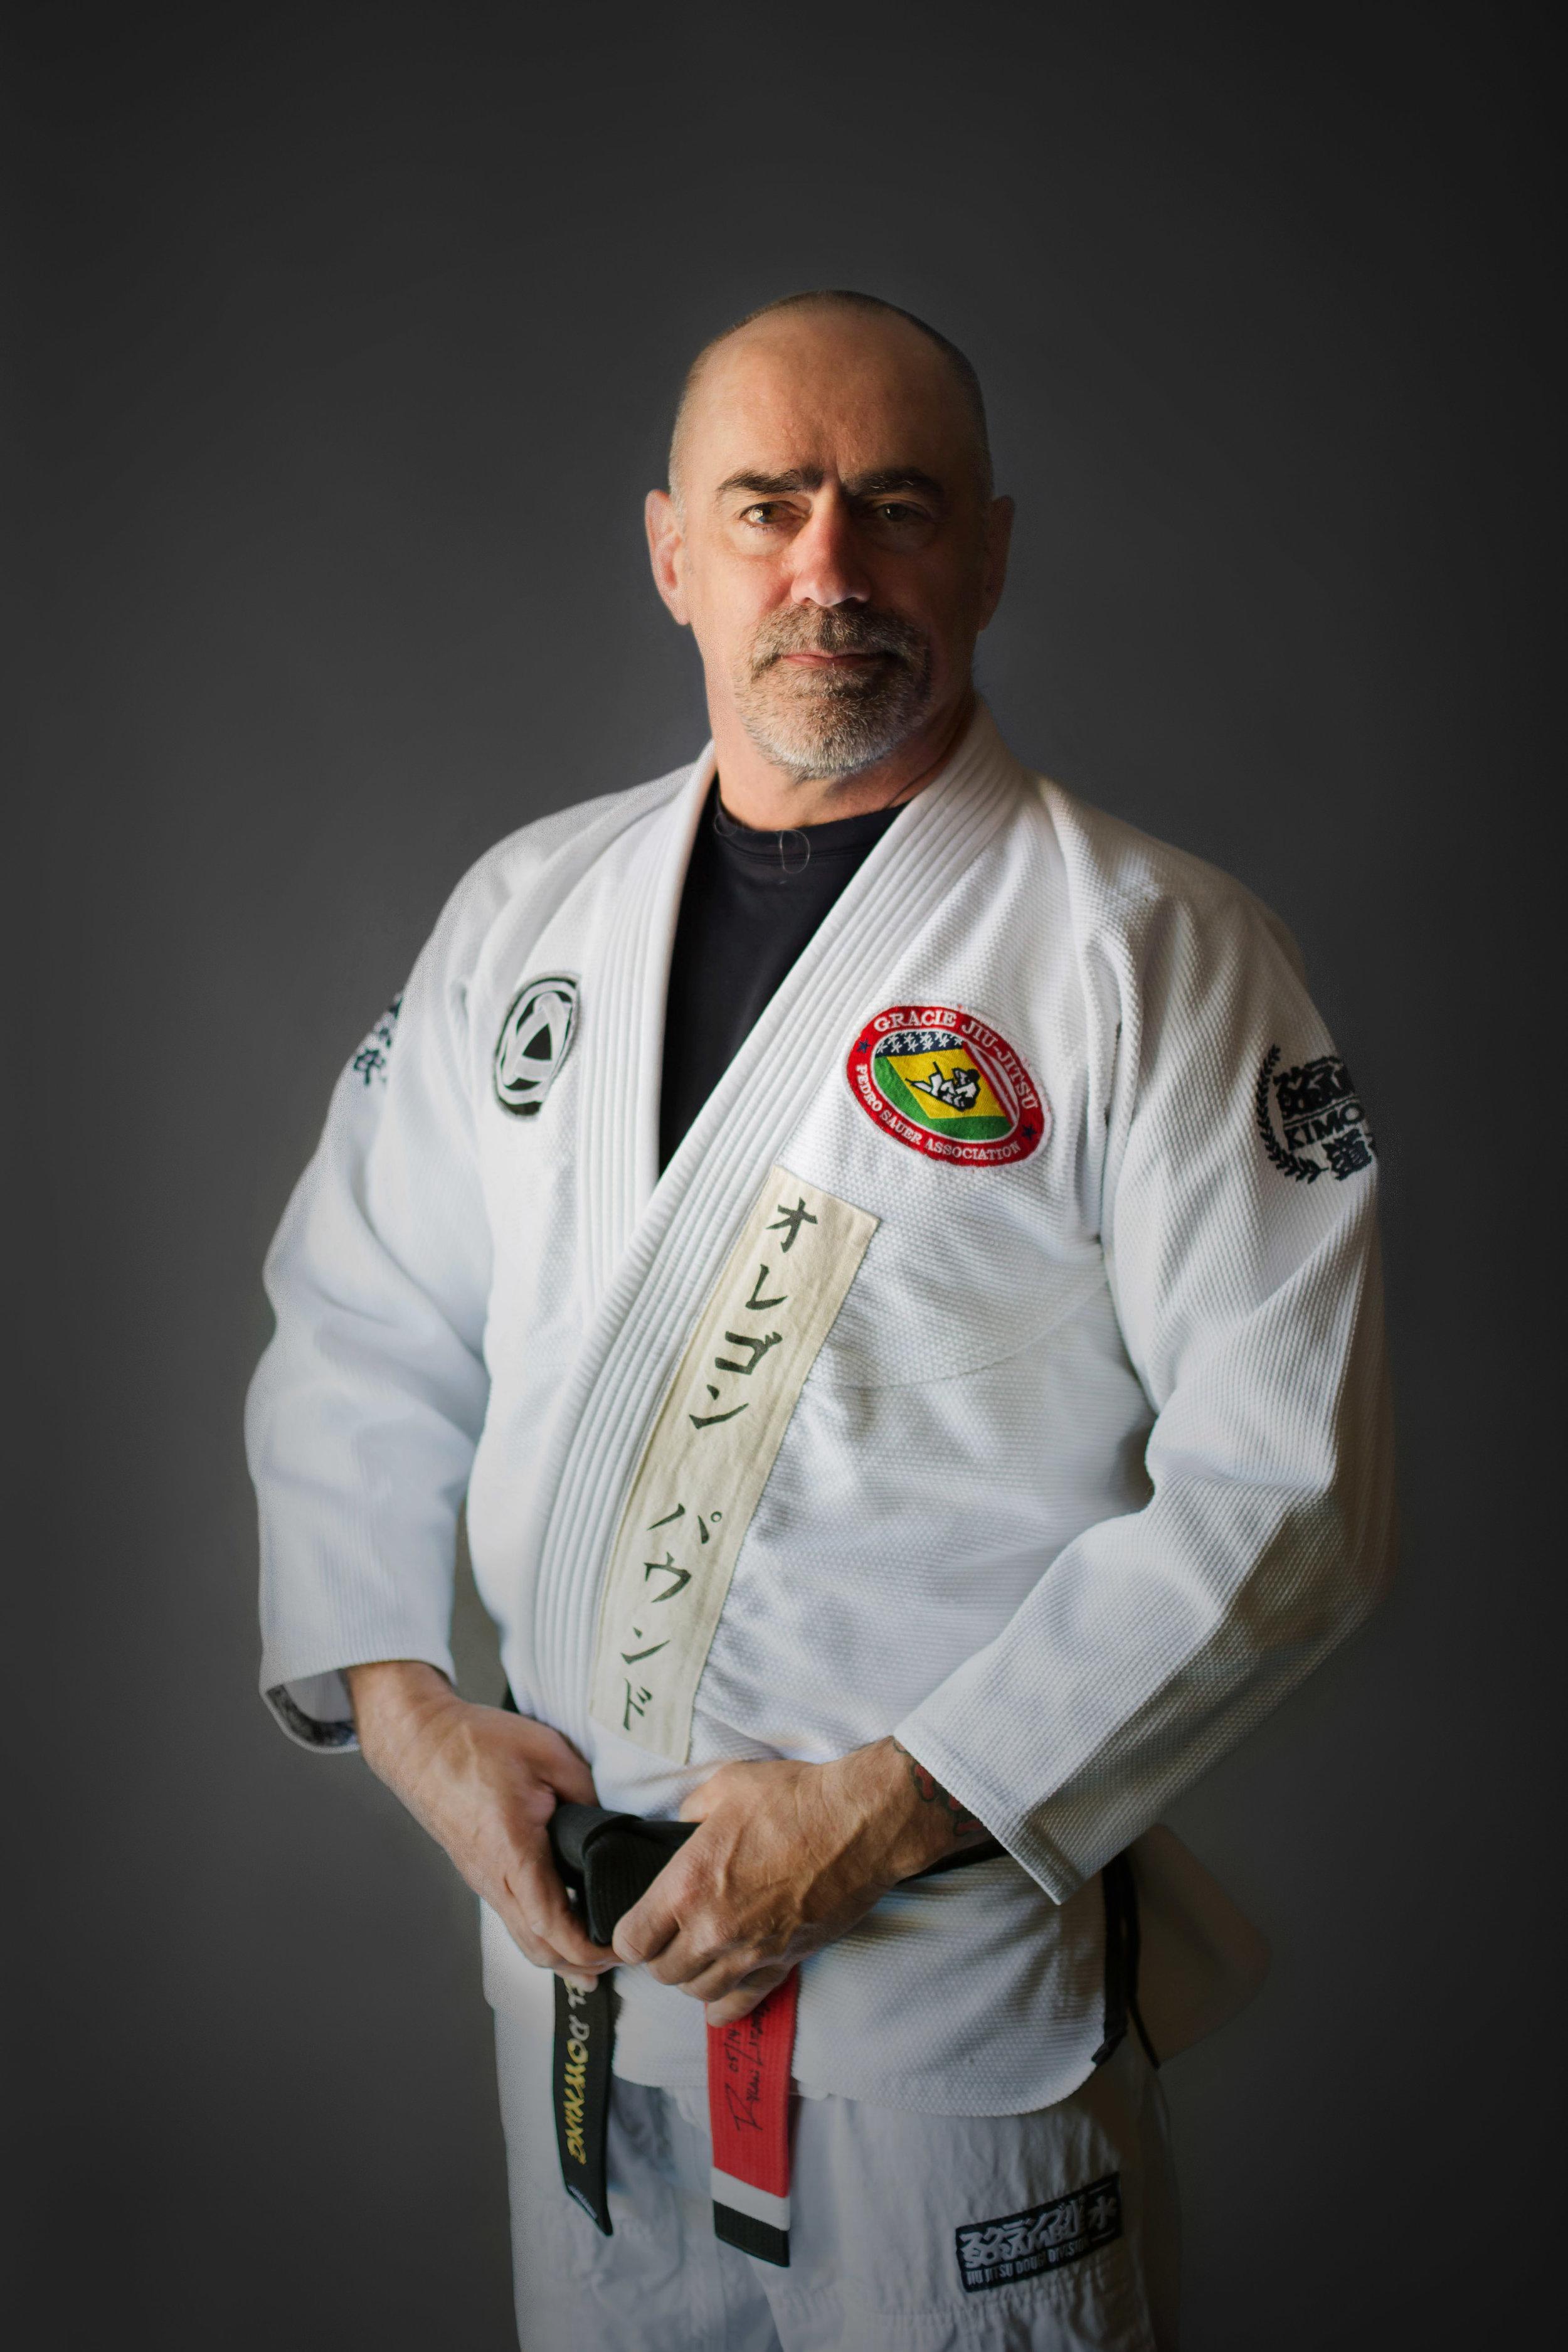 130 Black Belt portrait - 1.jpg